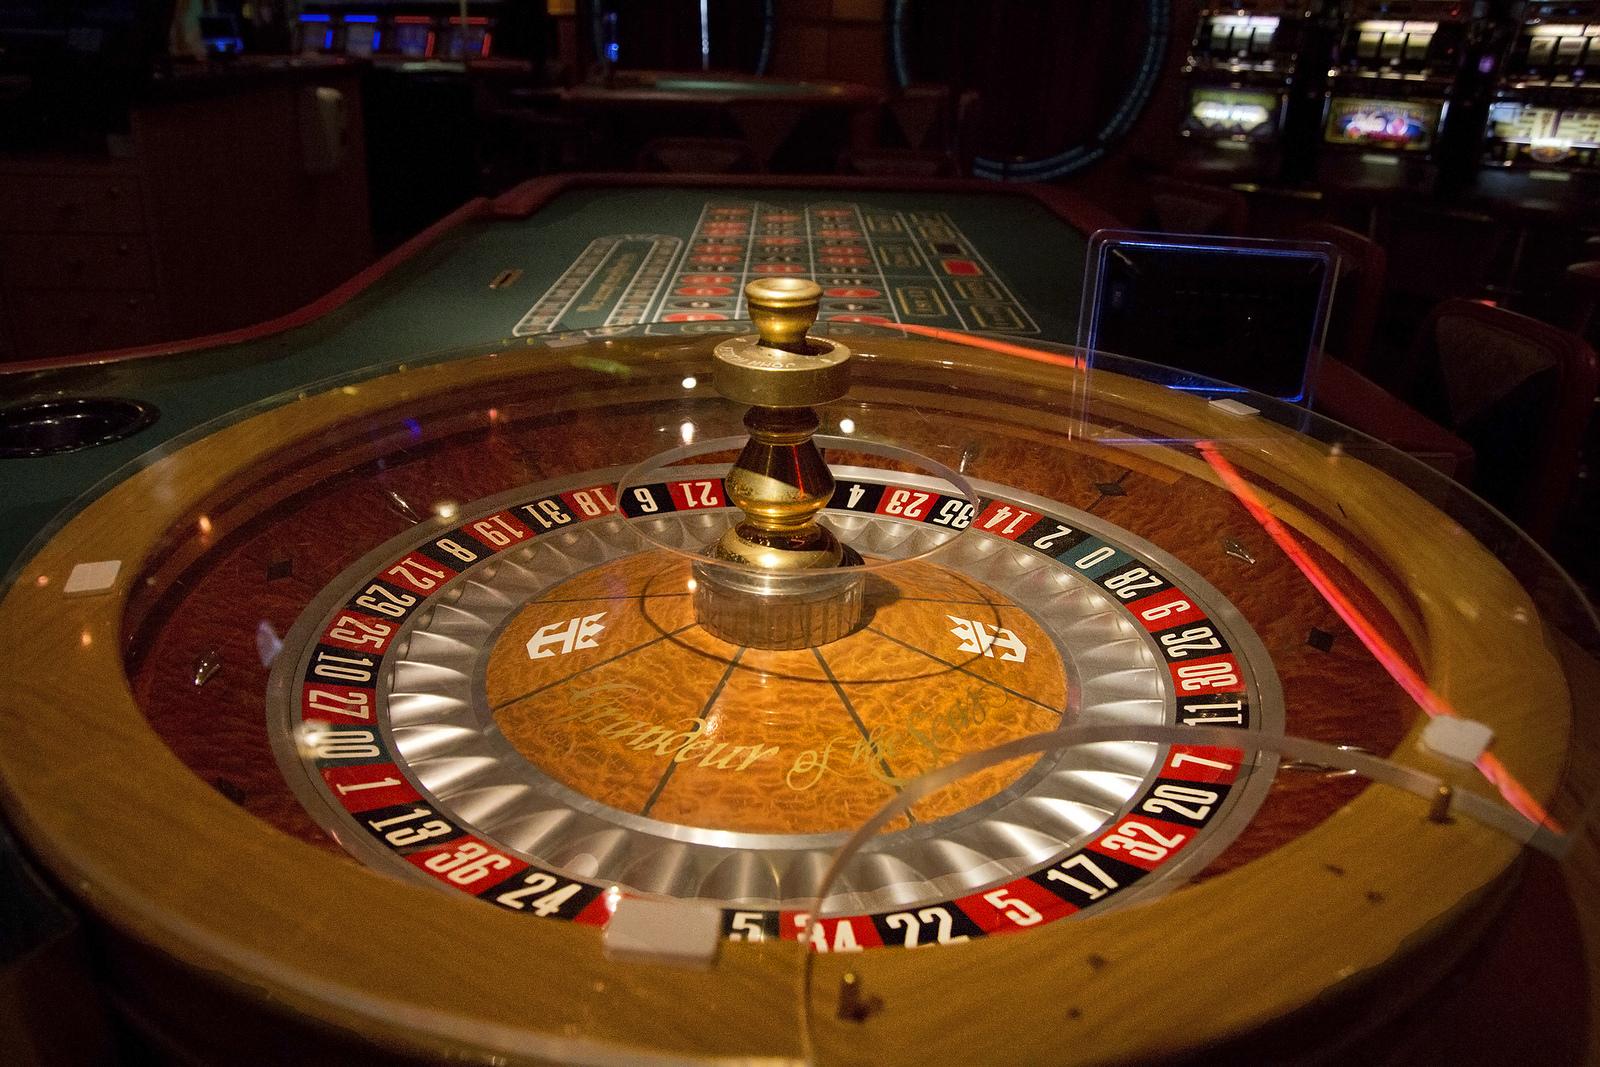 Las vegas usa casino no deposit bonus codes